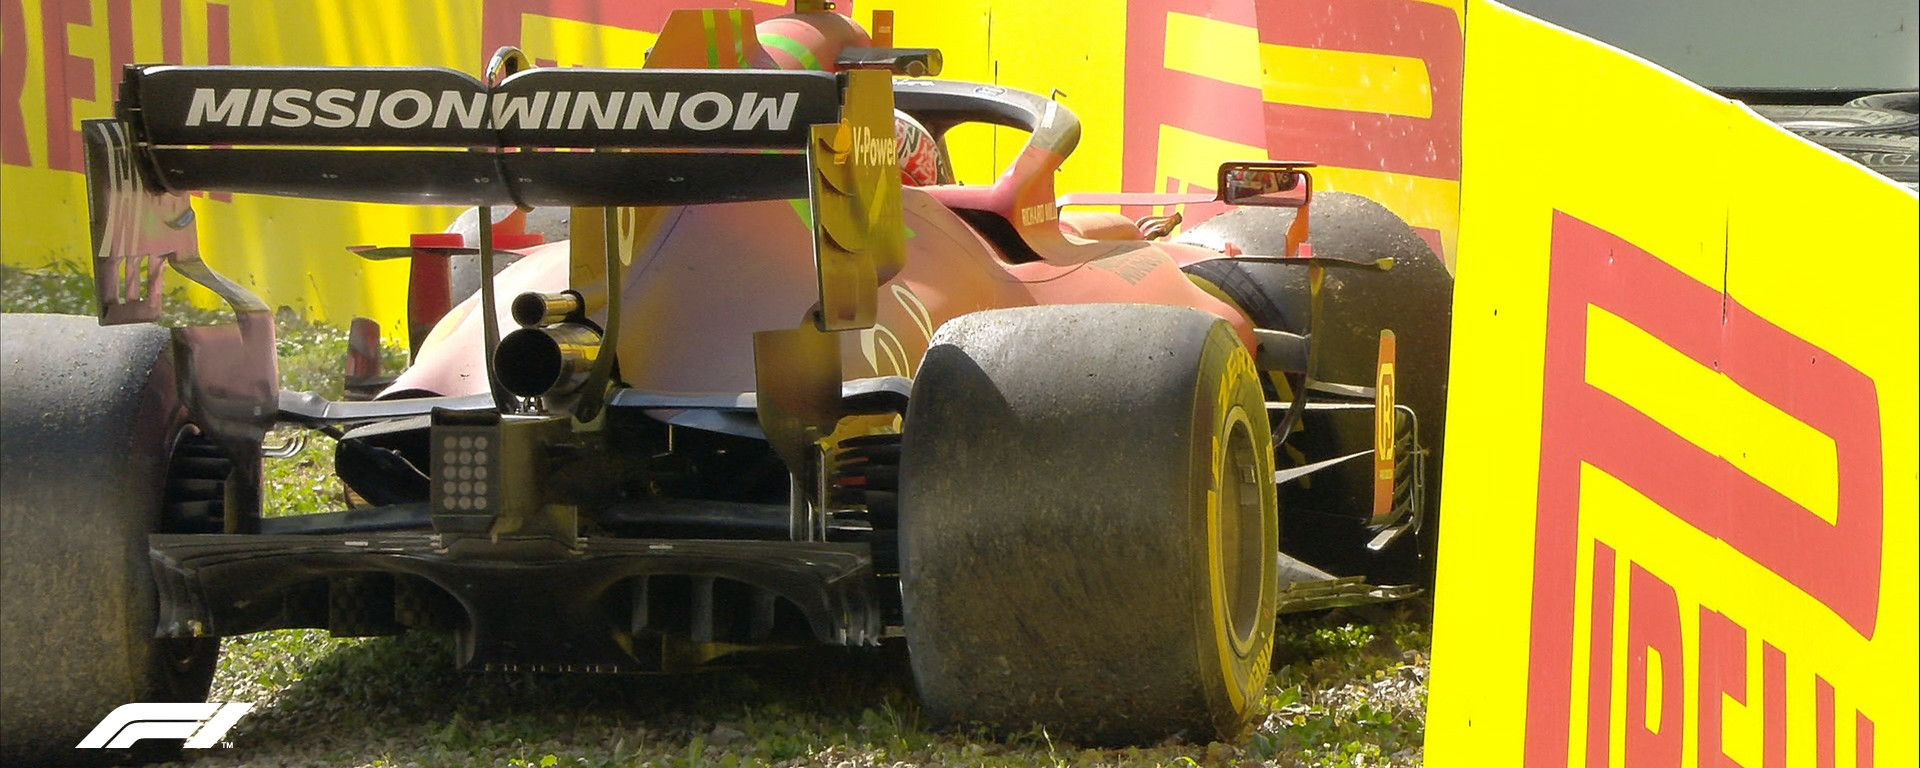 F1 GP Emilia Romagna 2021, Imola: l'incidente di Charles Leclerc (Scuderia Ferrari)